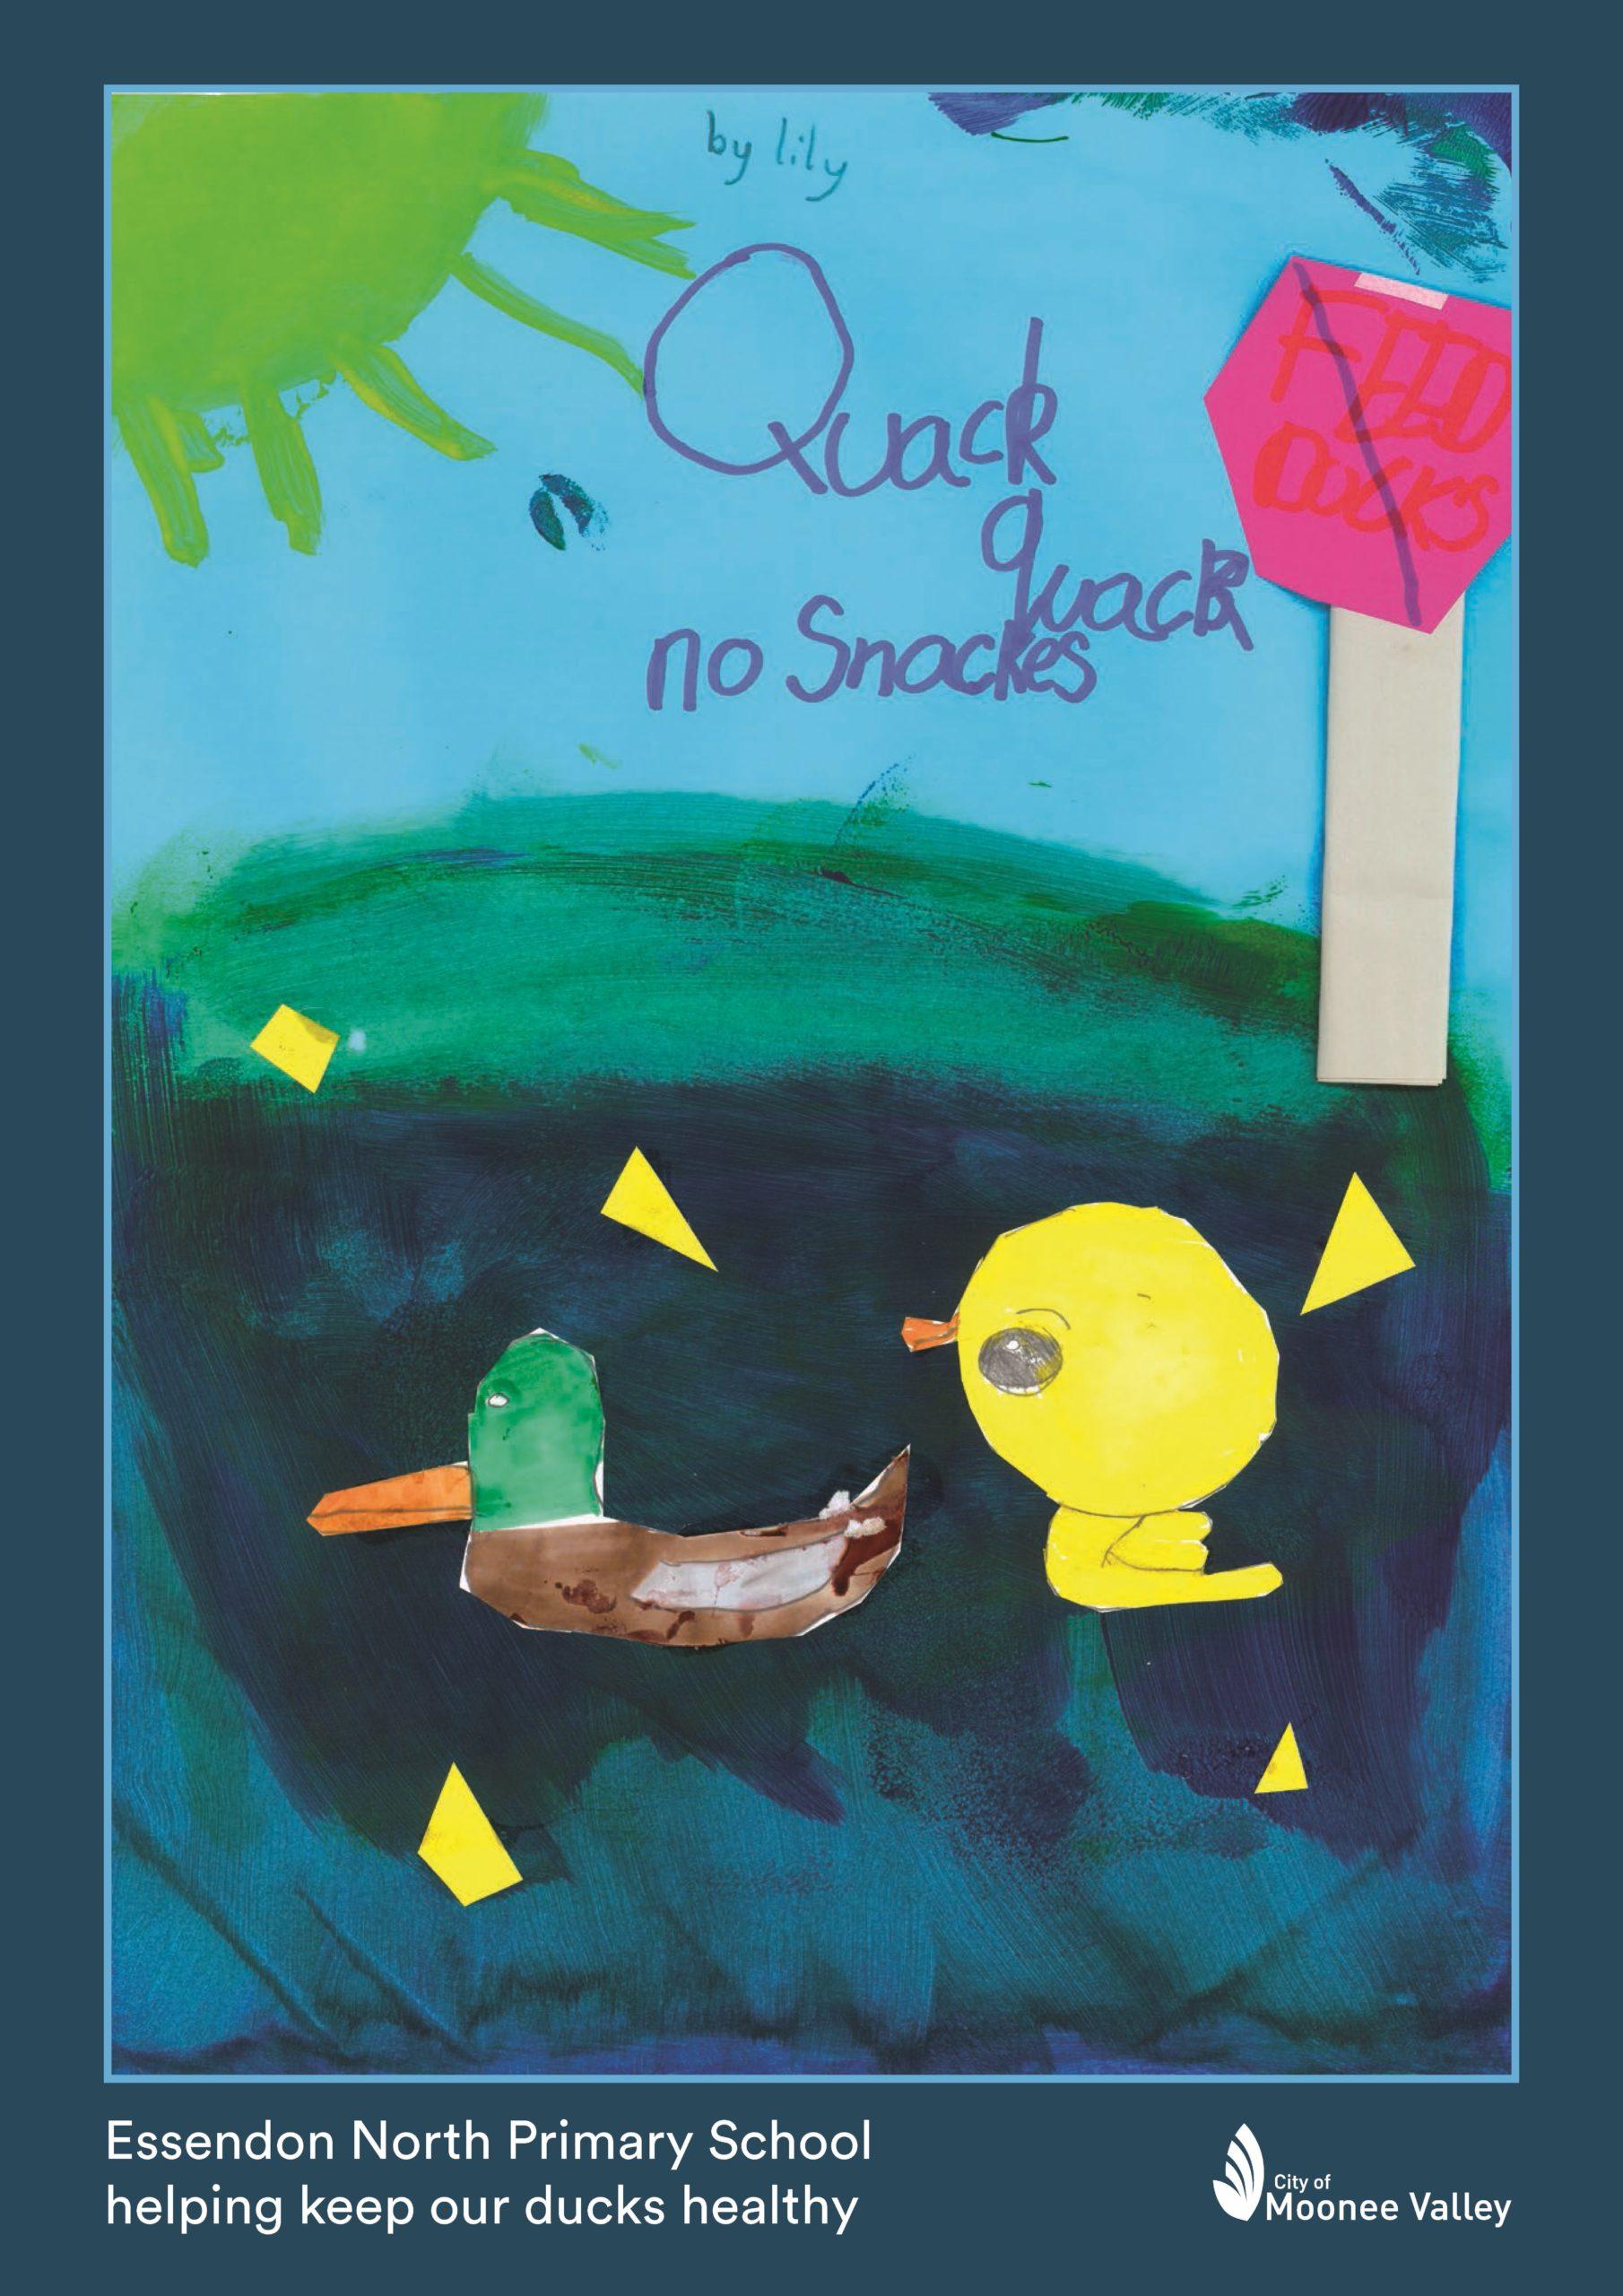 20 215088 ENPS Woodlands Park Duck Poster Lily